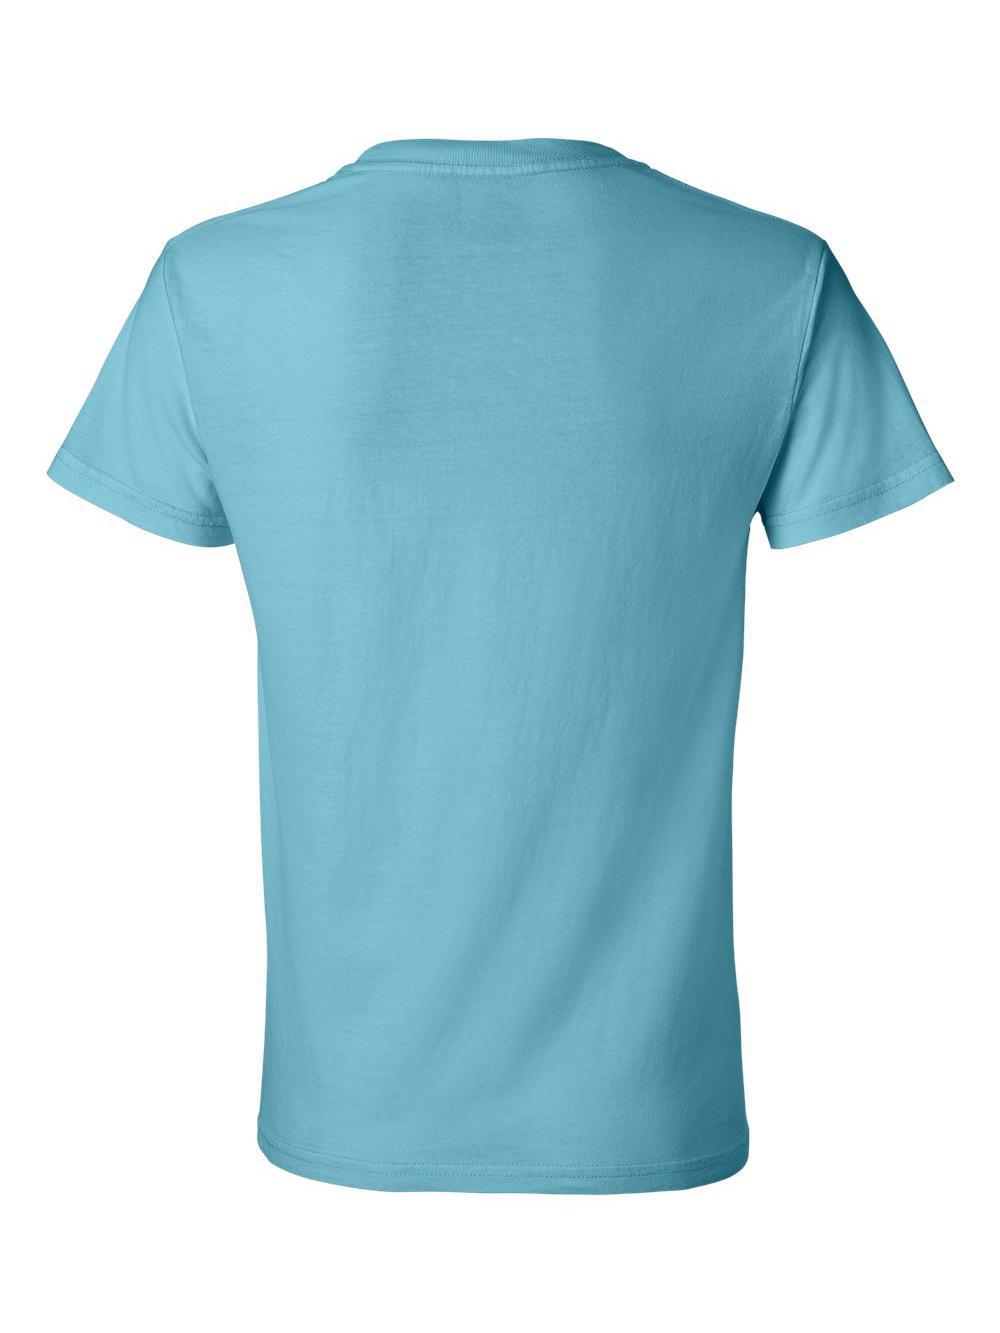 Comfort-Colors-Pigment-Dyed-Ringspun-Women-039-s-Short-Sleeve-T-Shirt-3333 thumbnail 23